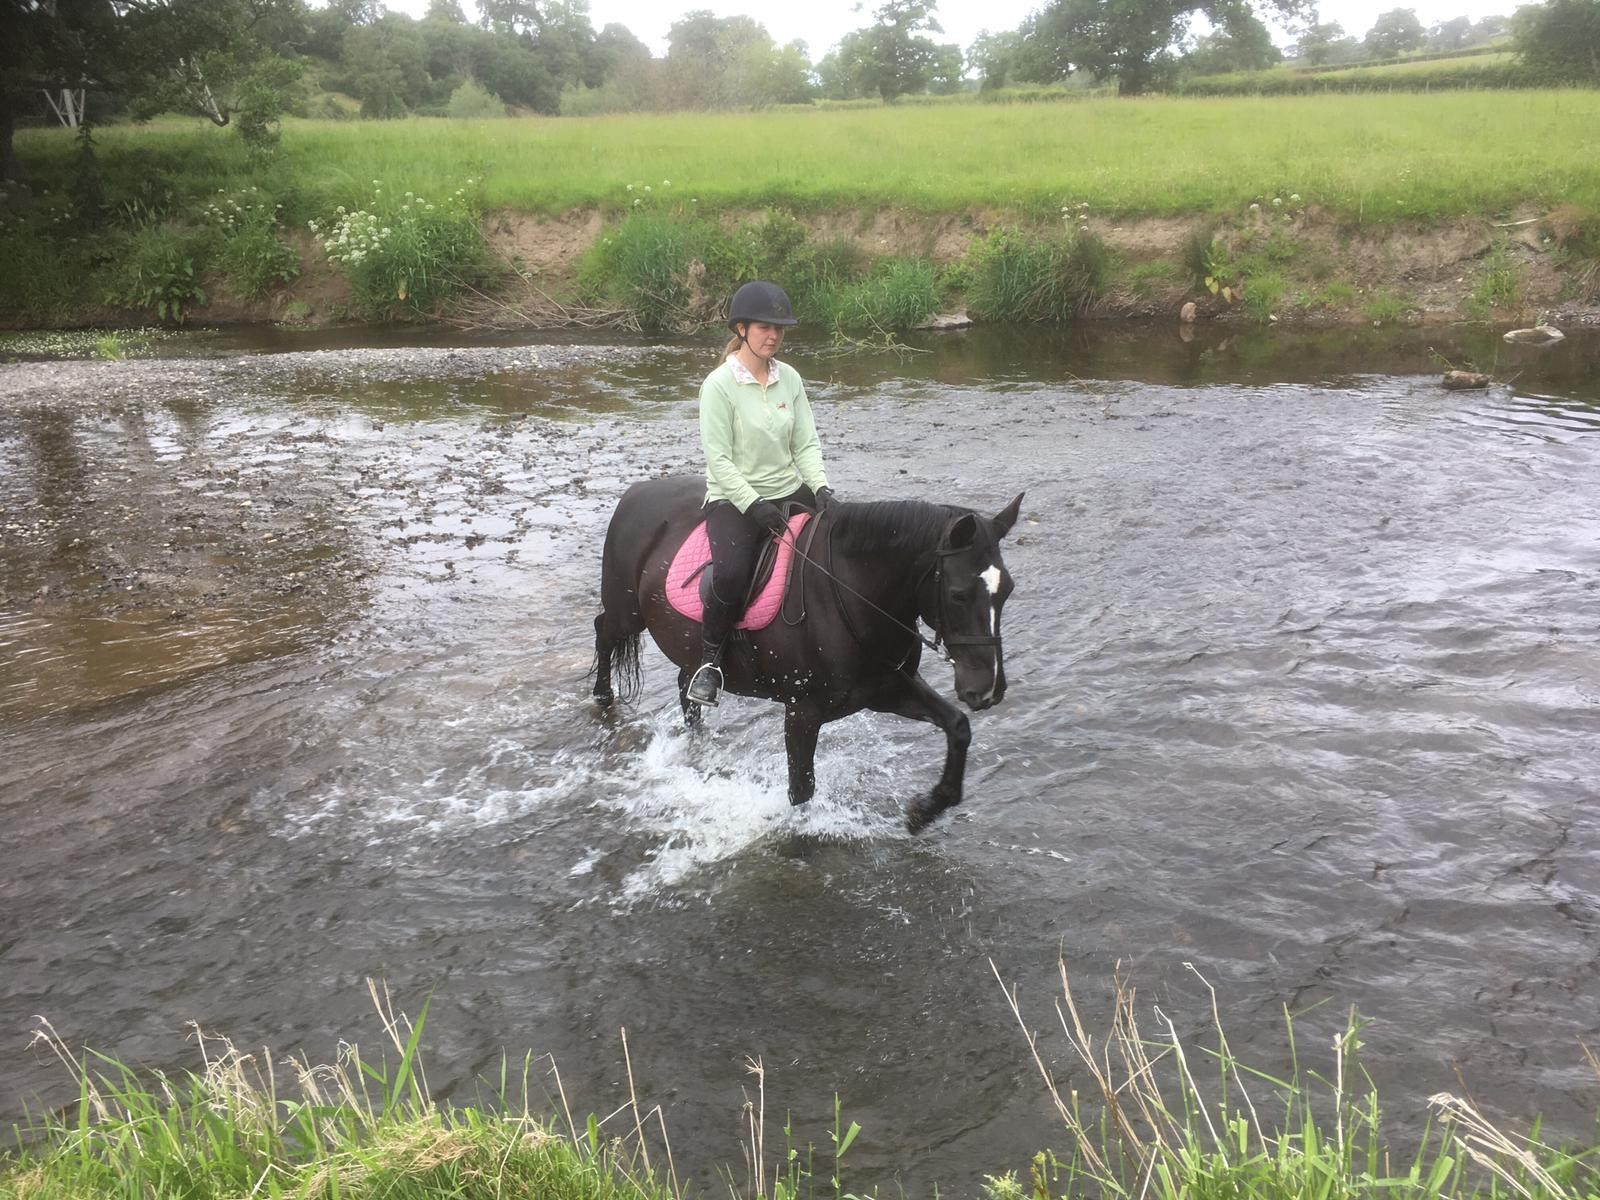 Llannerch river black horse